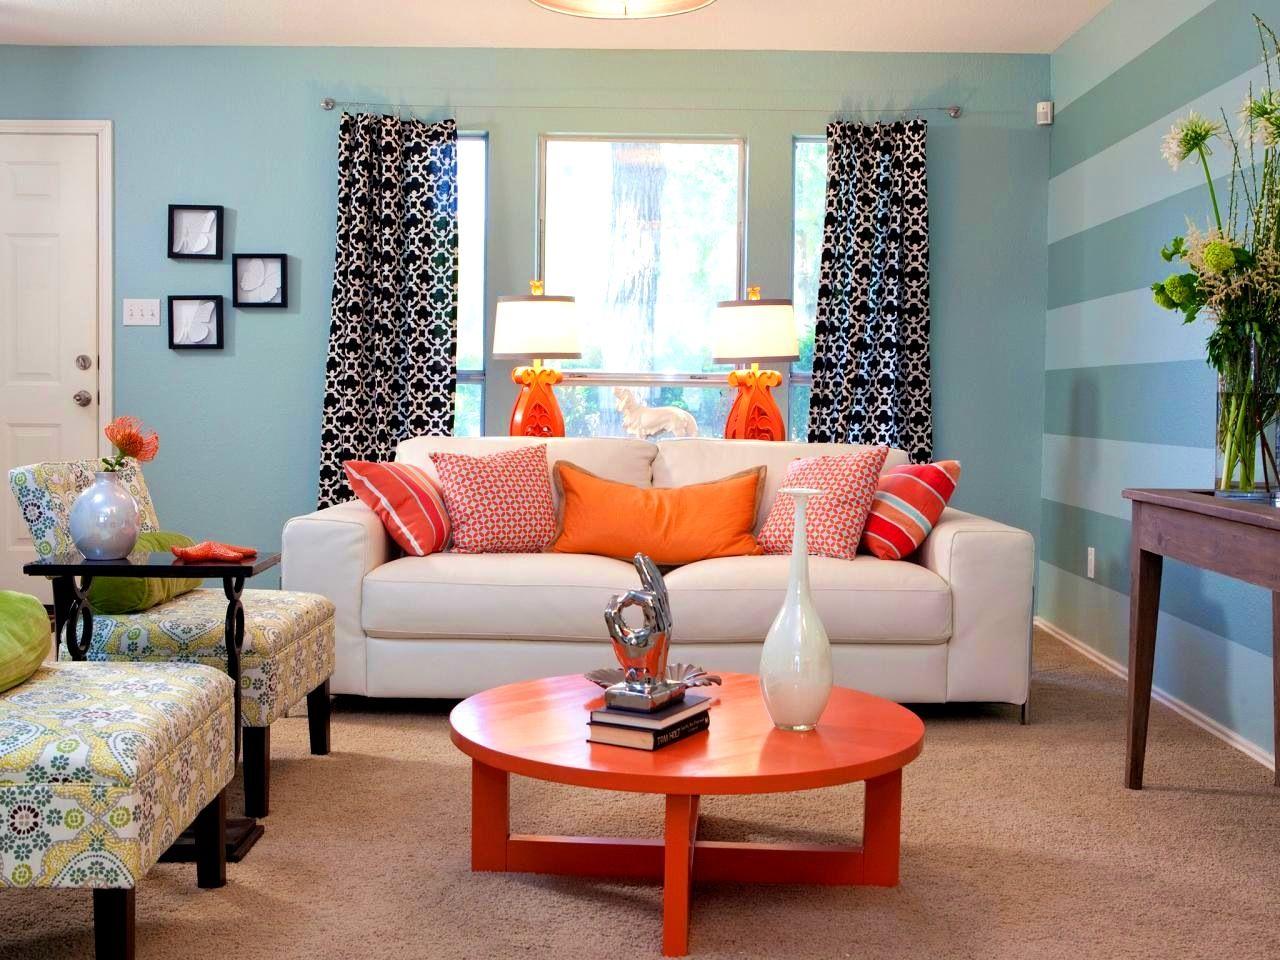 Bedroomfascinating Grey Living Rooms Orange And Blue Bbadcebff